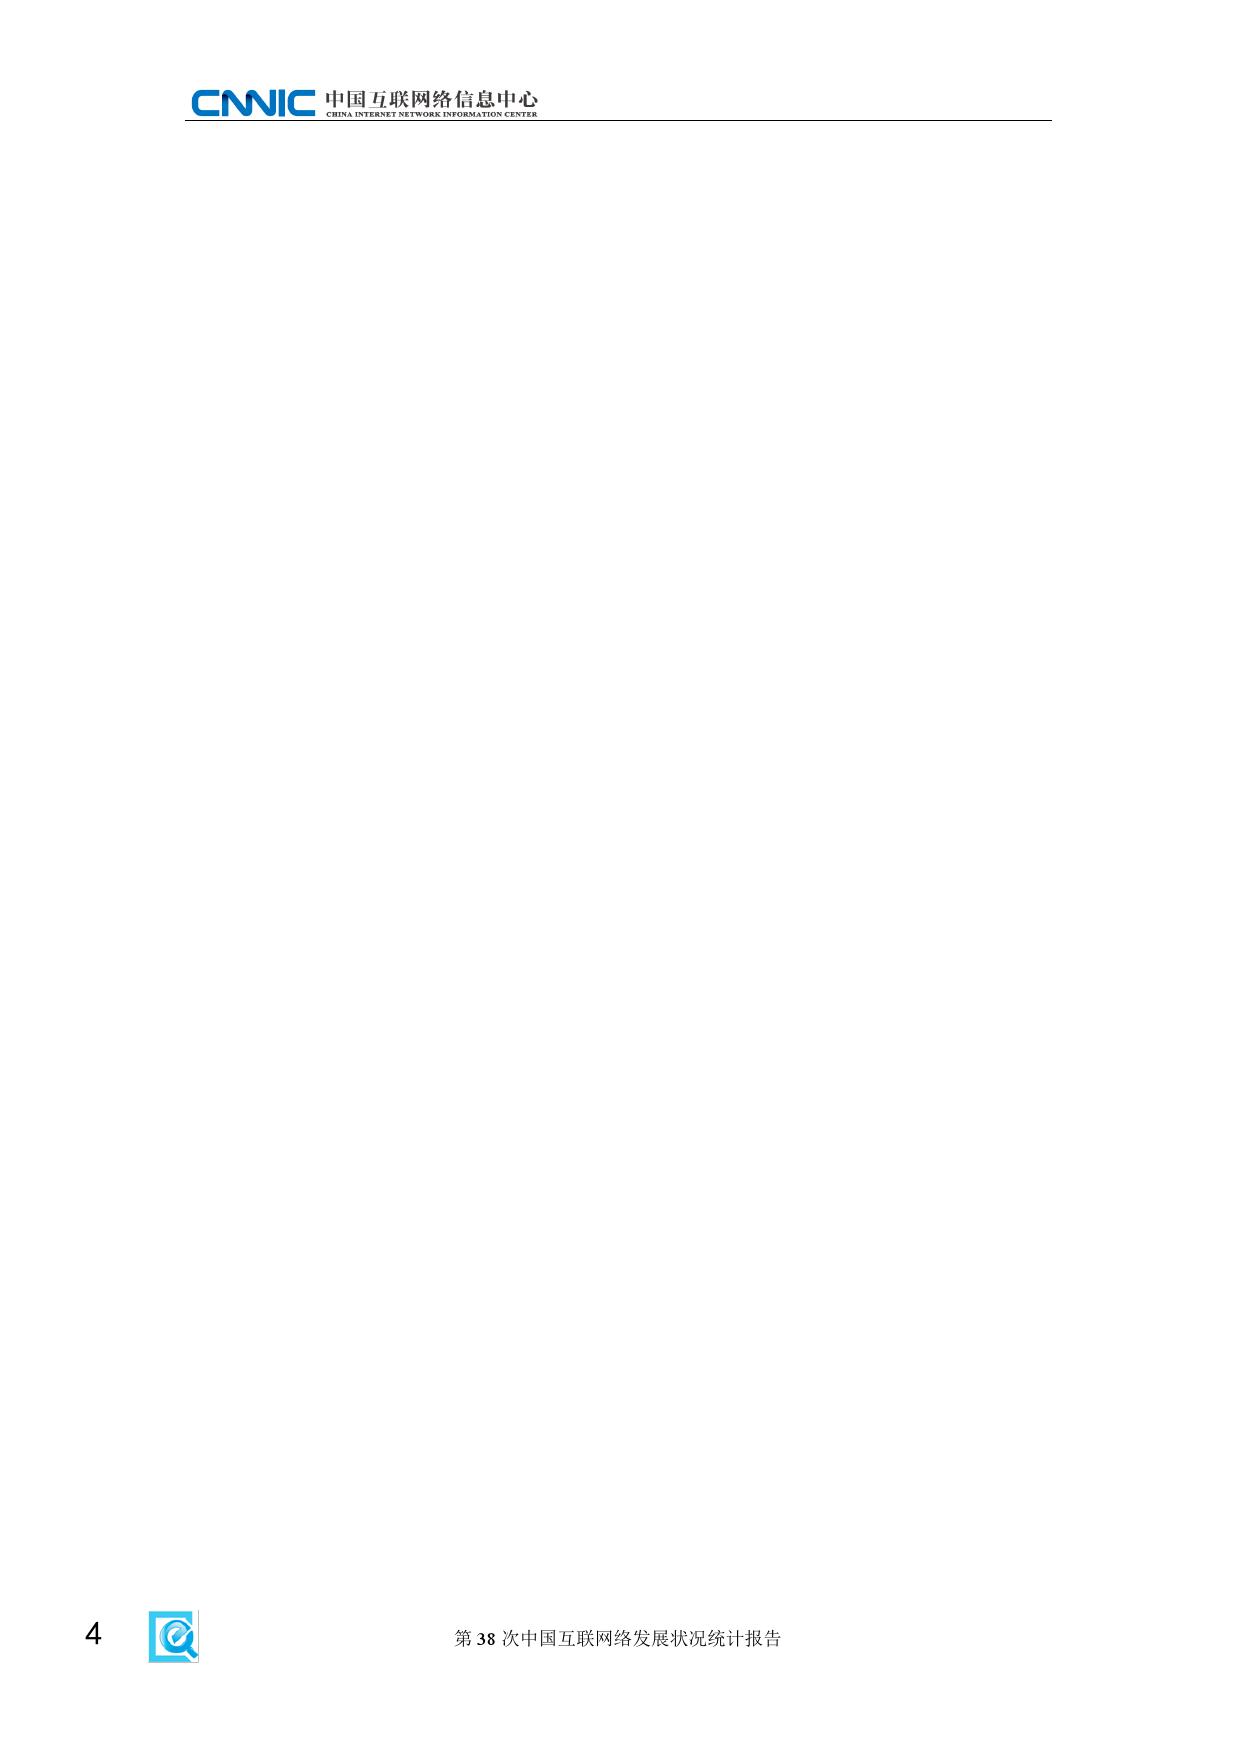 CNNIC:2015年第38次中国互联网络发展状况统计报告_000010